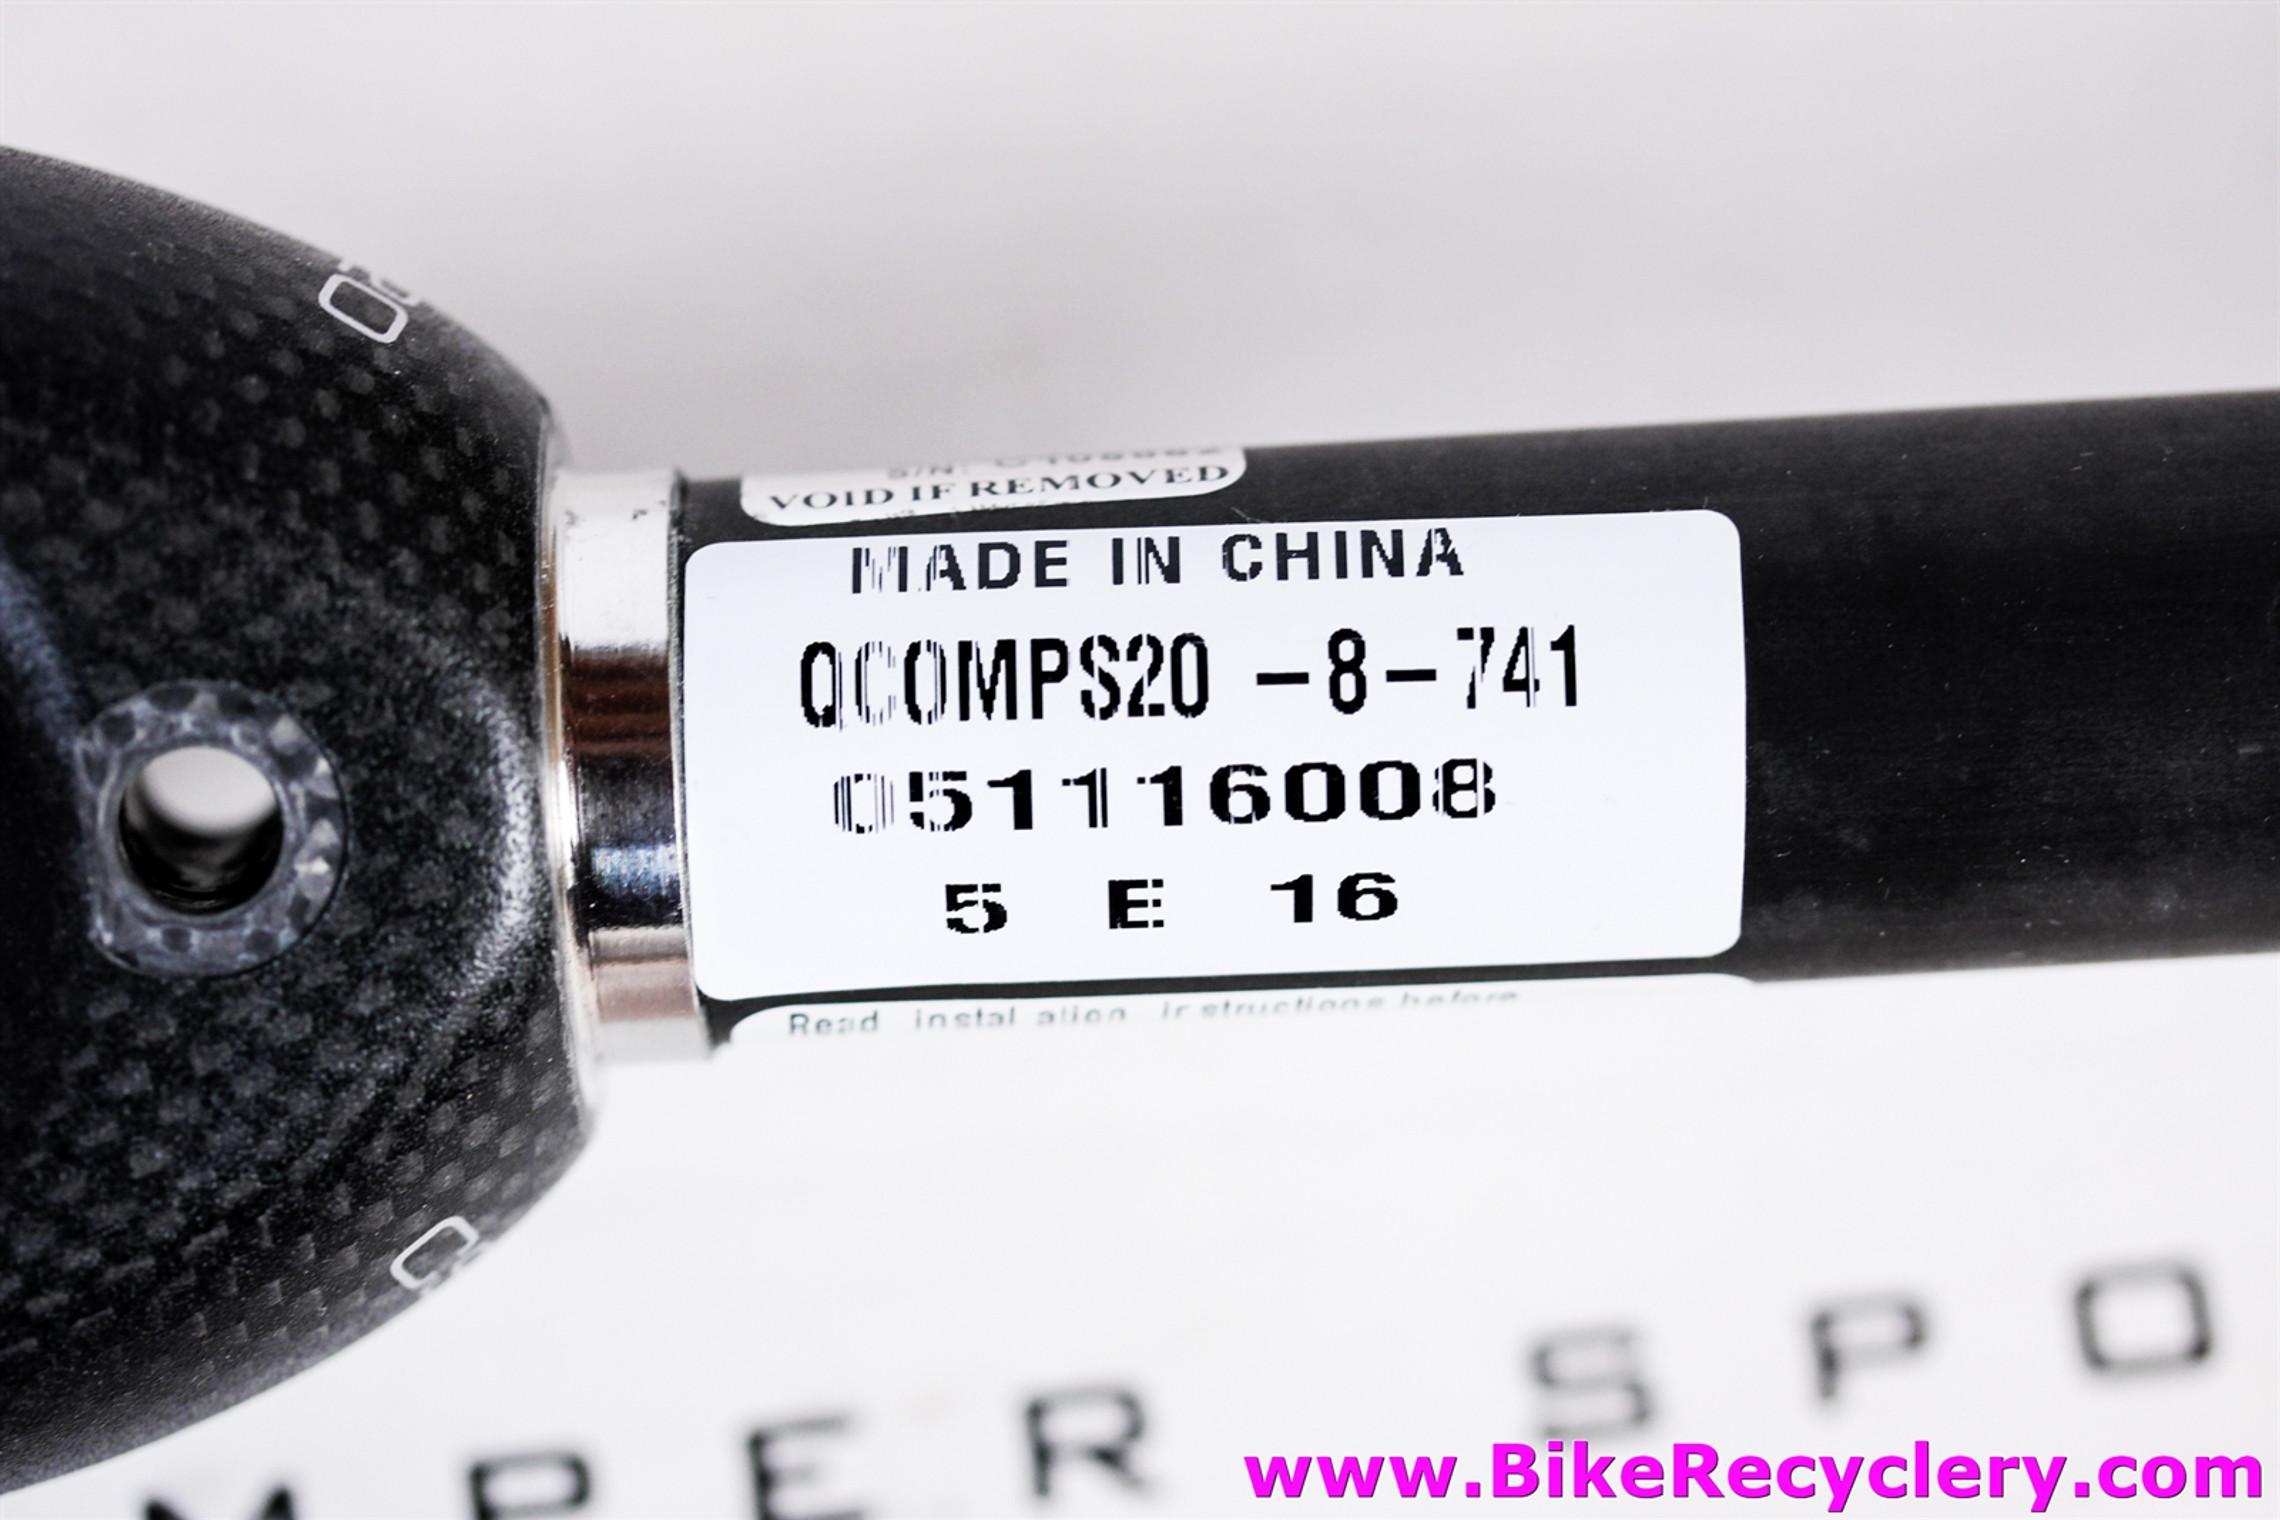 "True Temper Alpha Q CS-20 CRT Carbon Road Fork: 700c - 1 1/8"" - 41mm Rake - 420g - Matte Black - Straight Blade (NEW)"